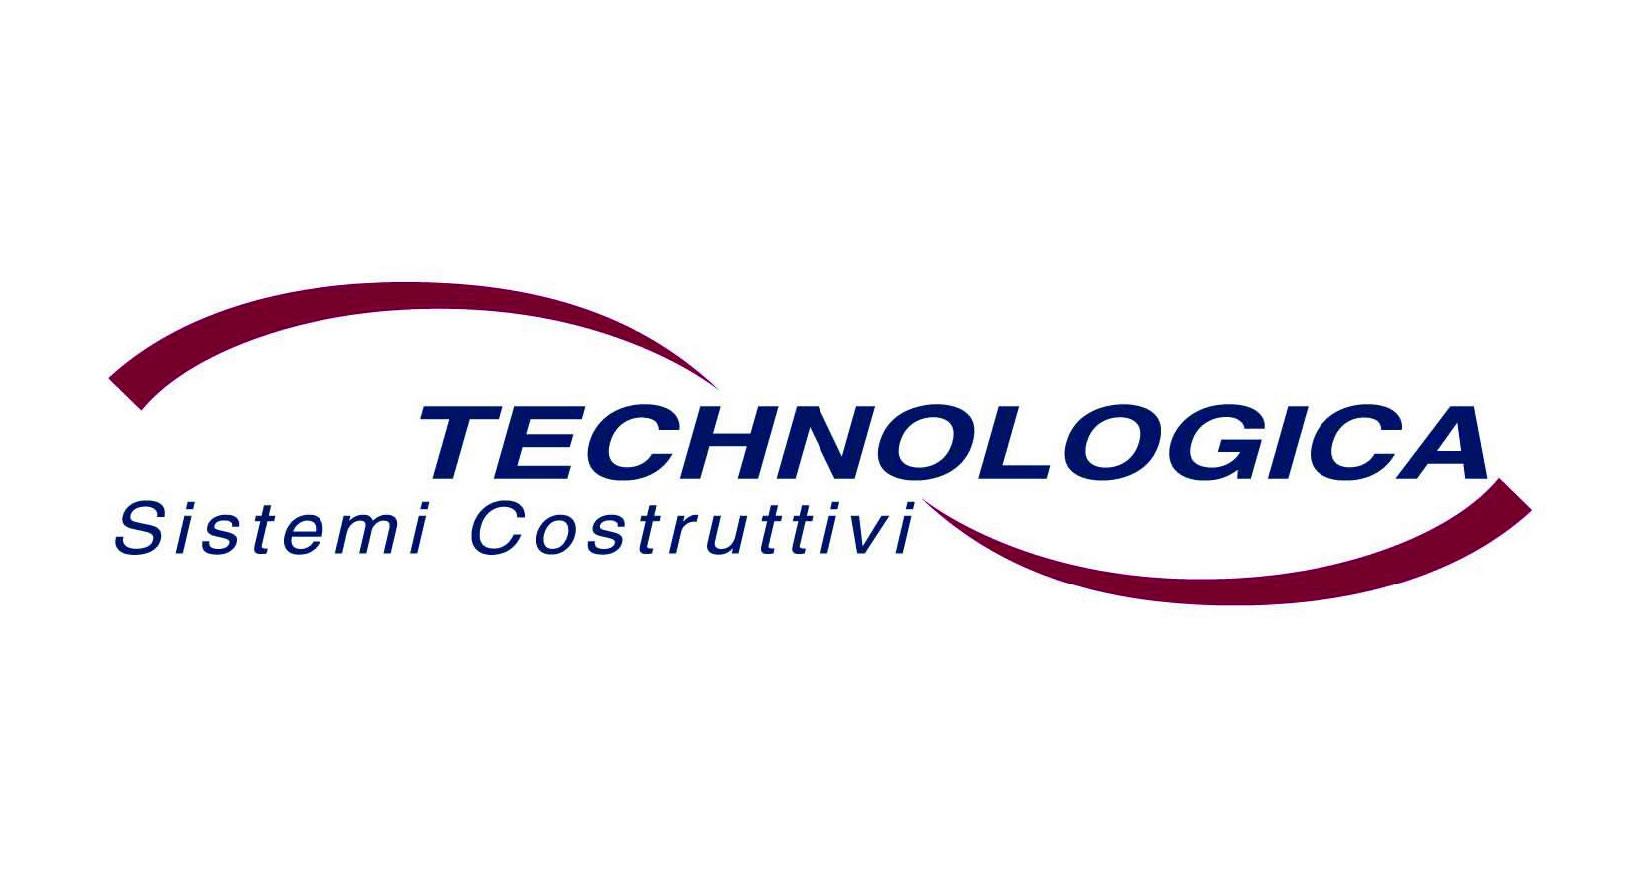 technologica-225x225